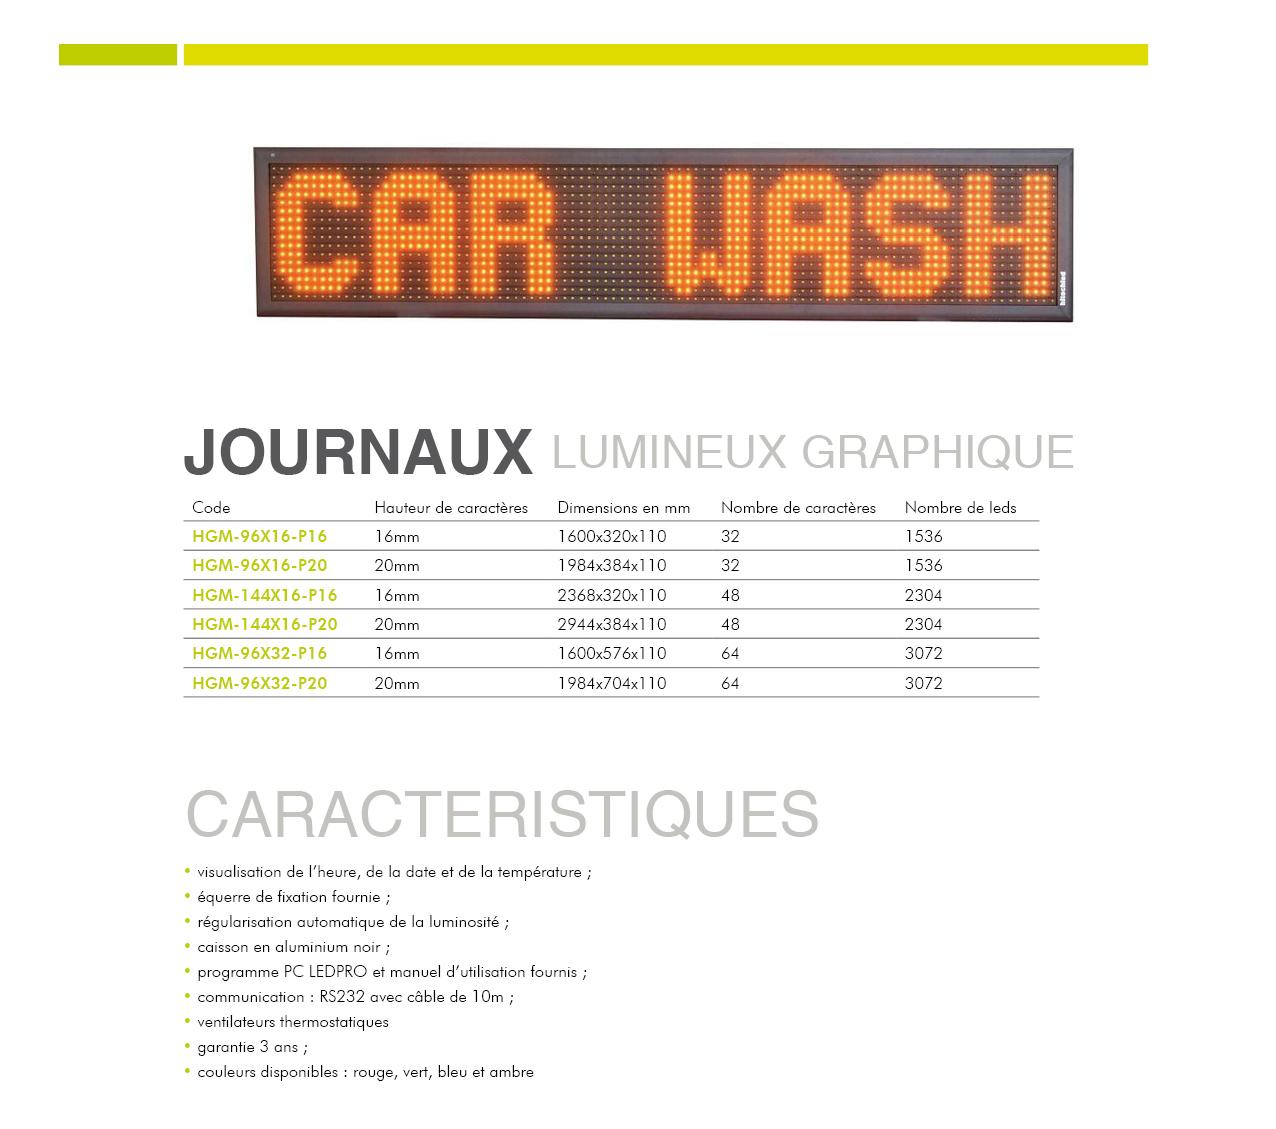 DEF-catalogue-gheury-23-06-2017176